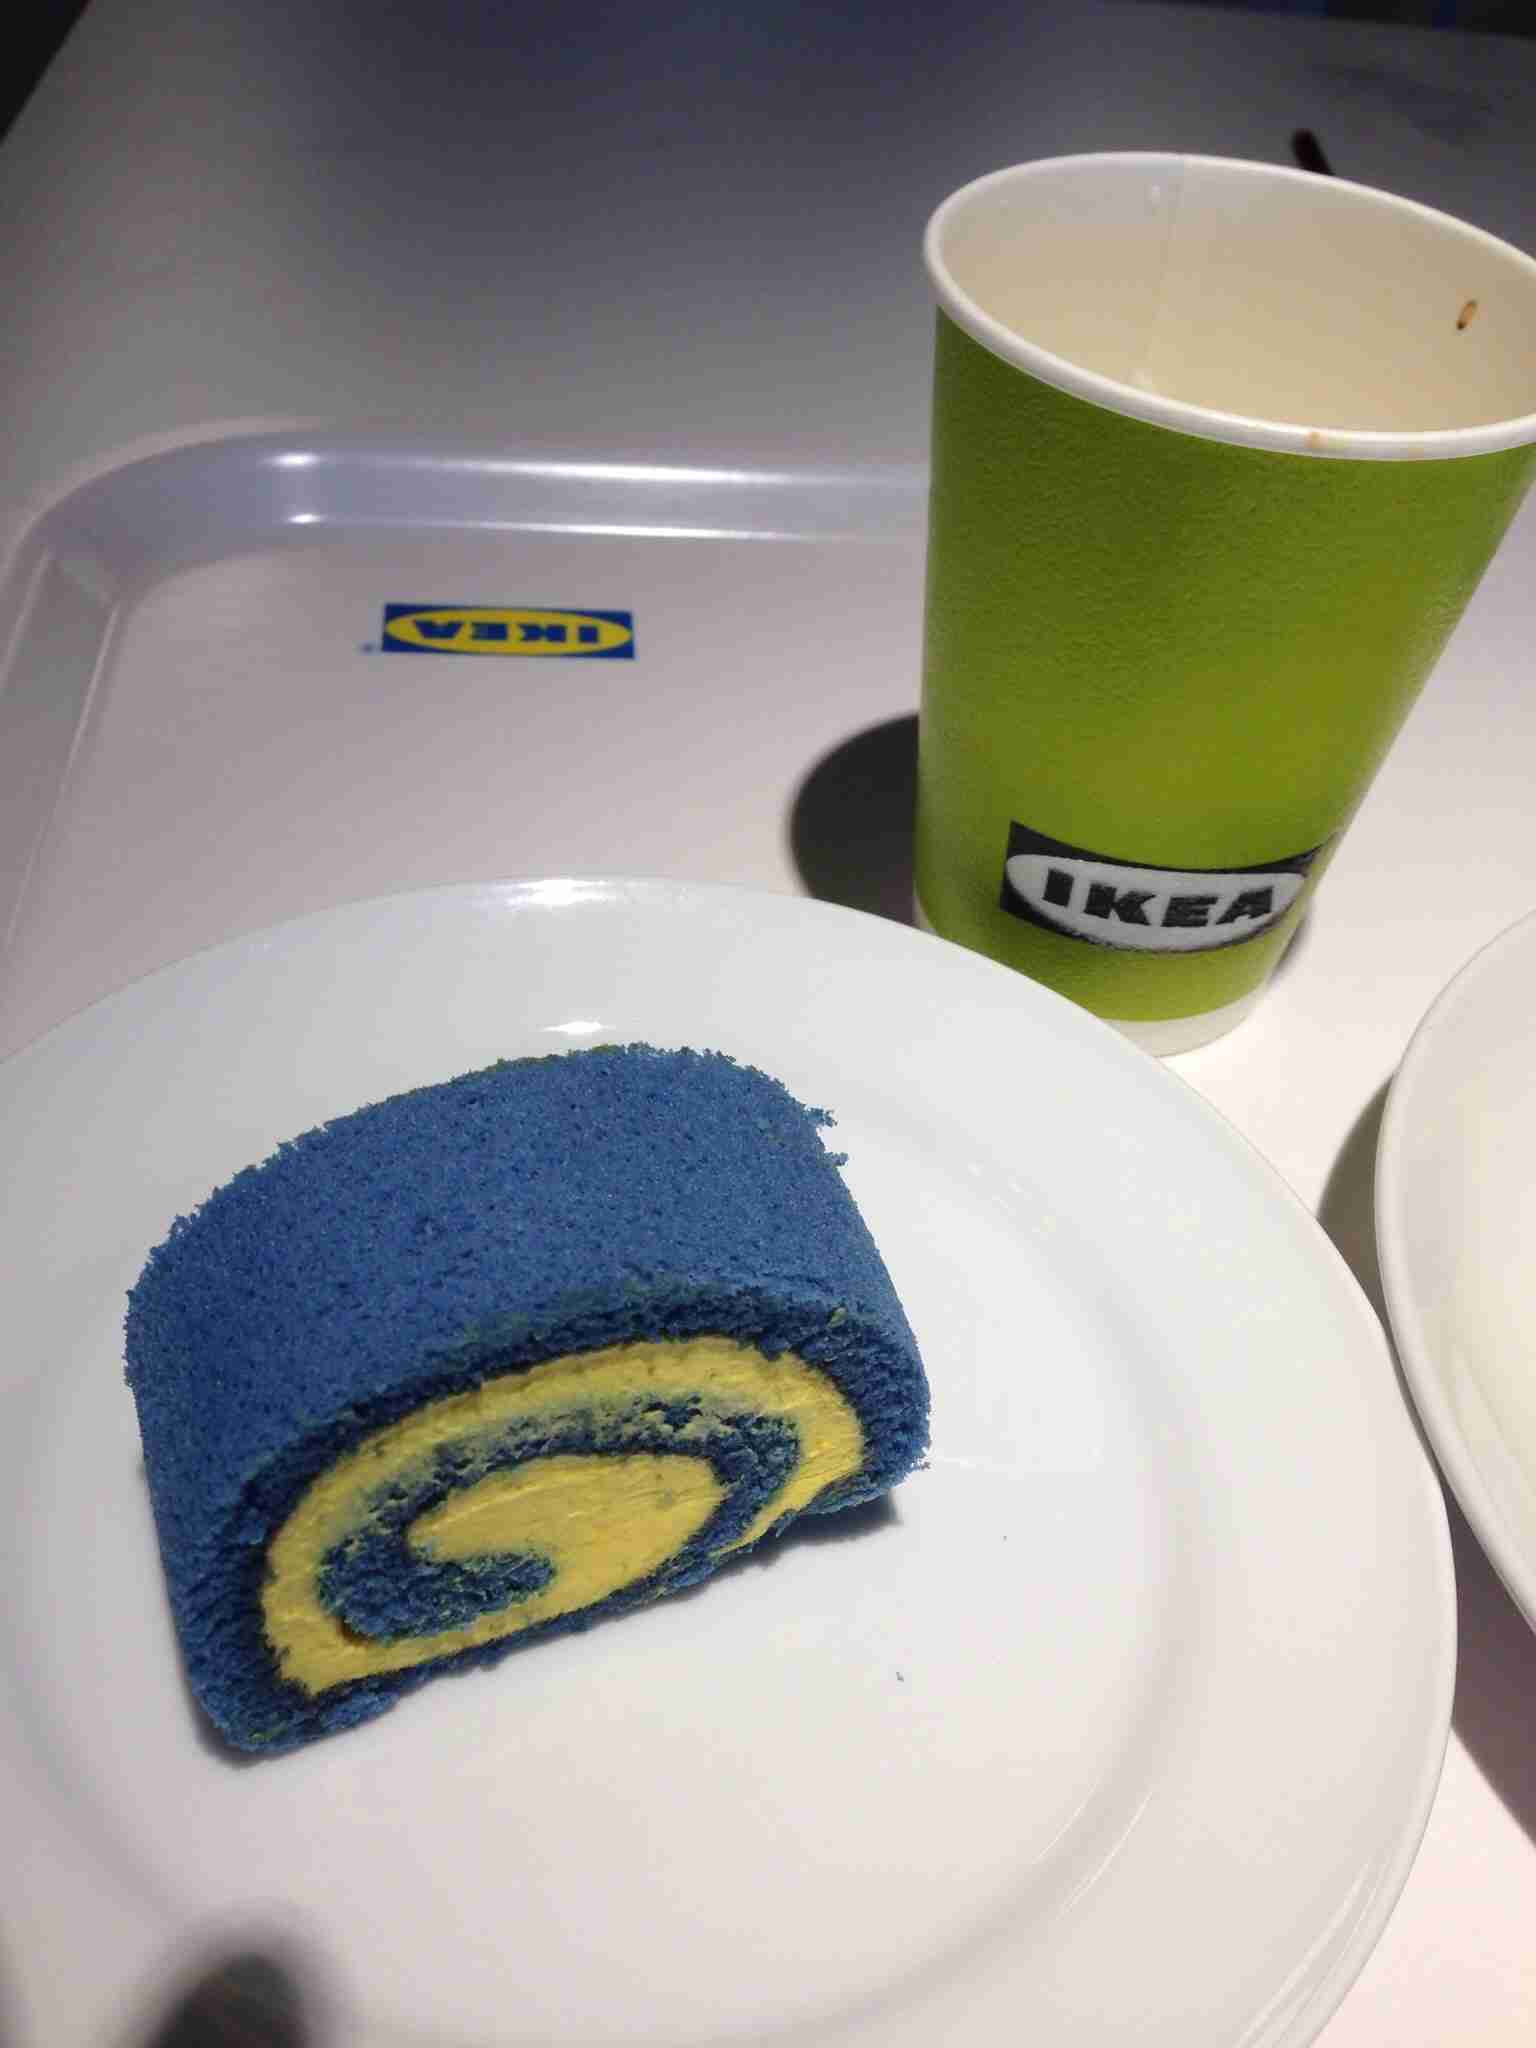 IKEAレストランでオススメのメニュー☆